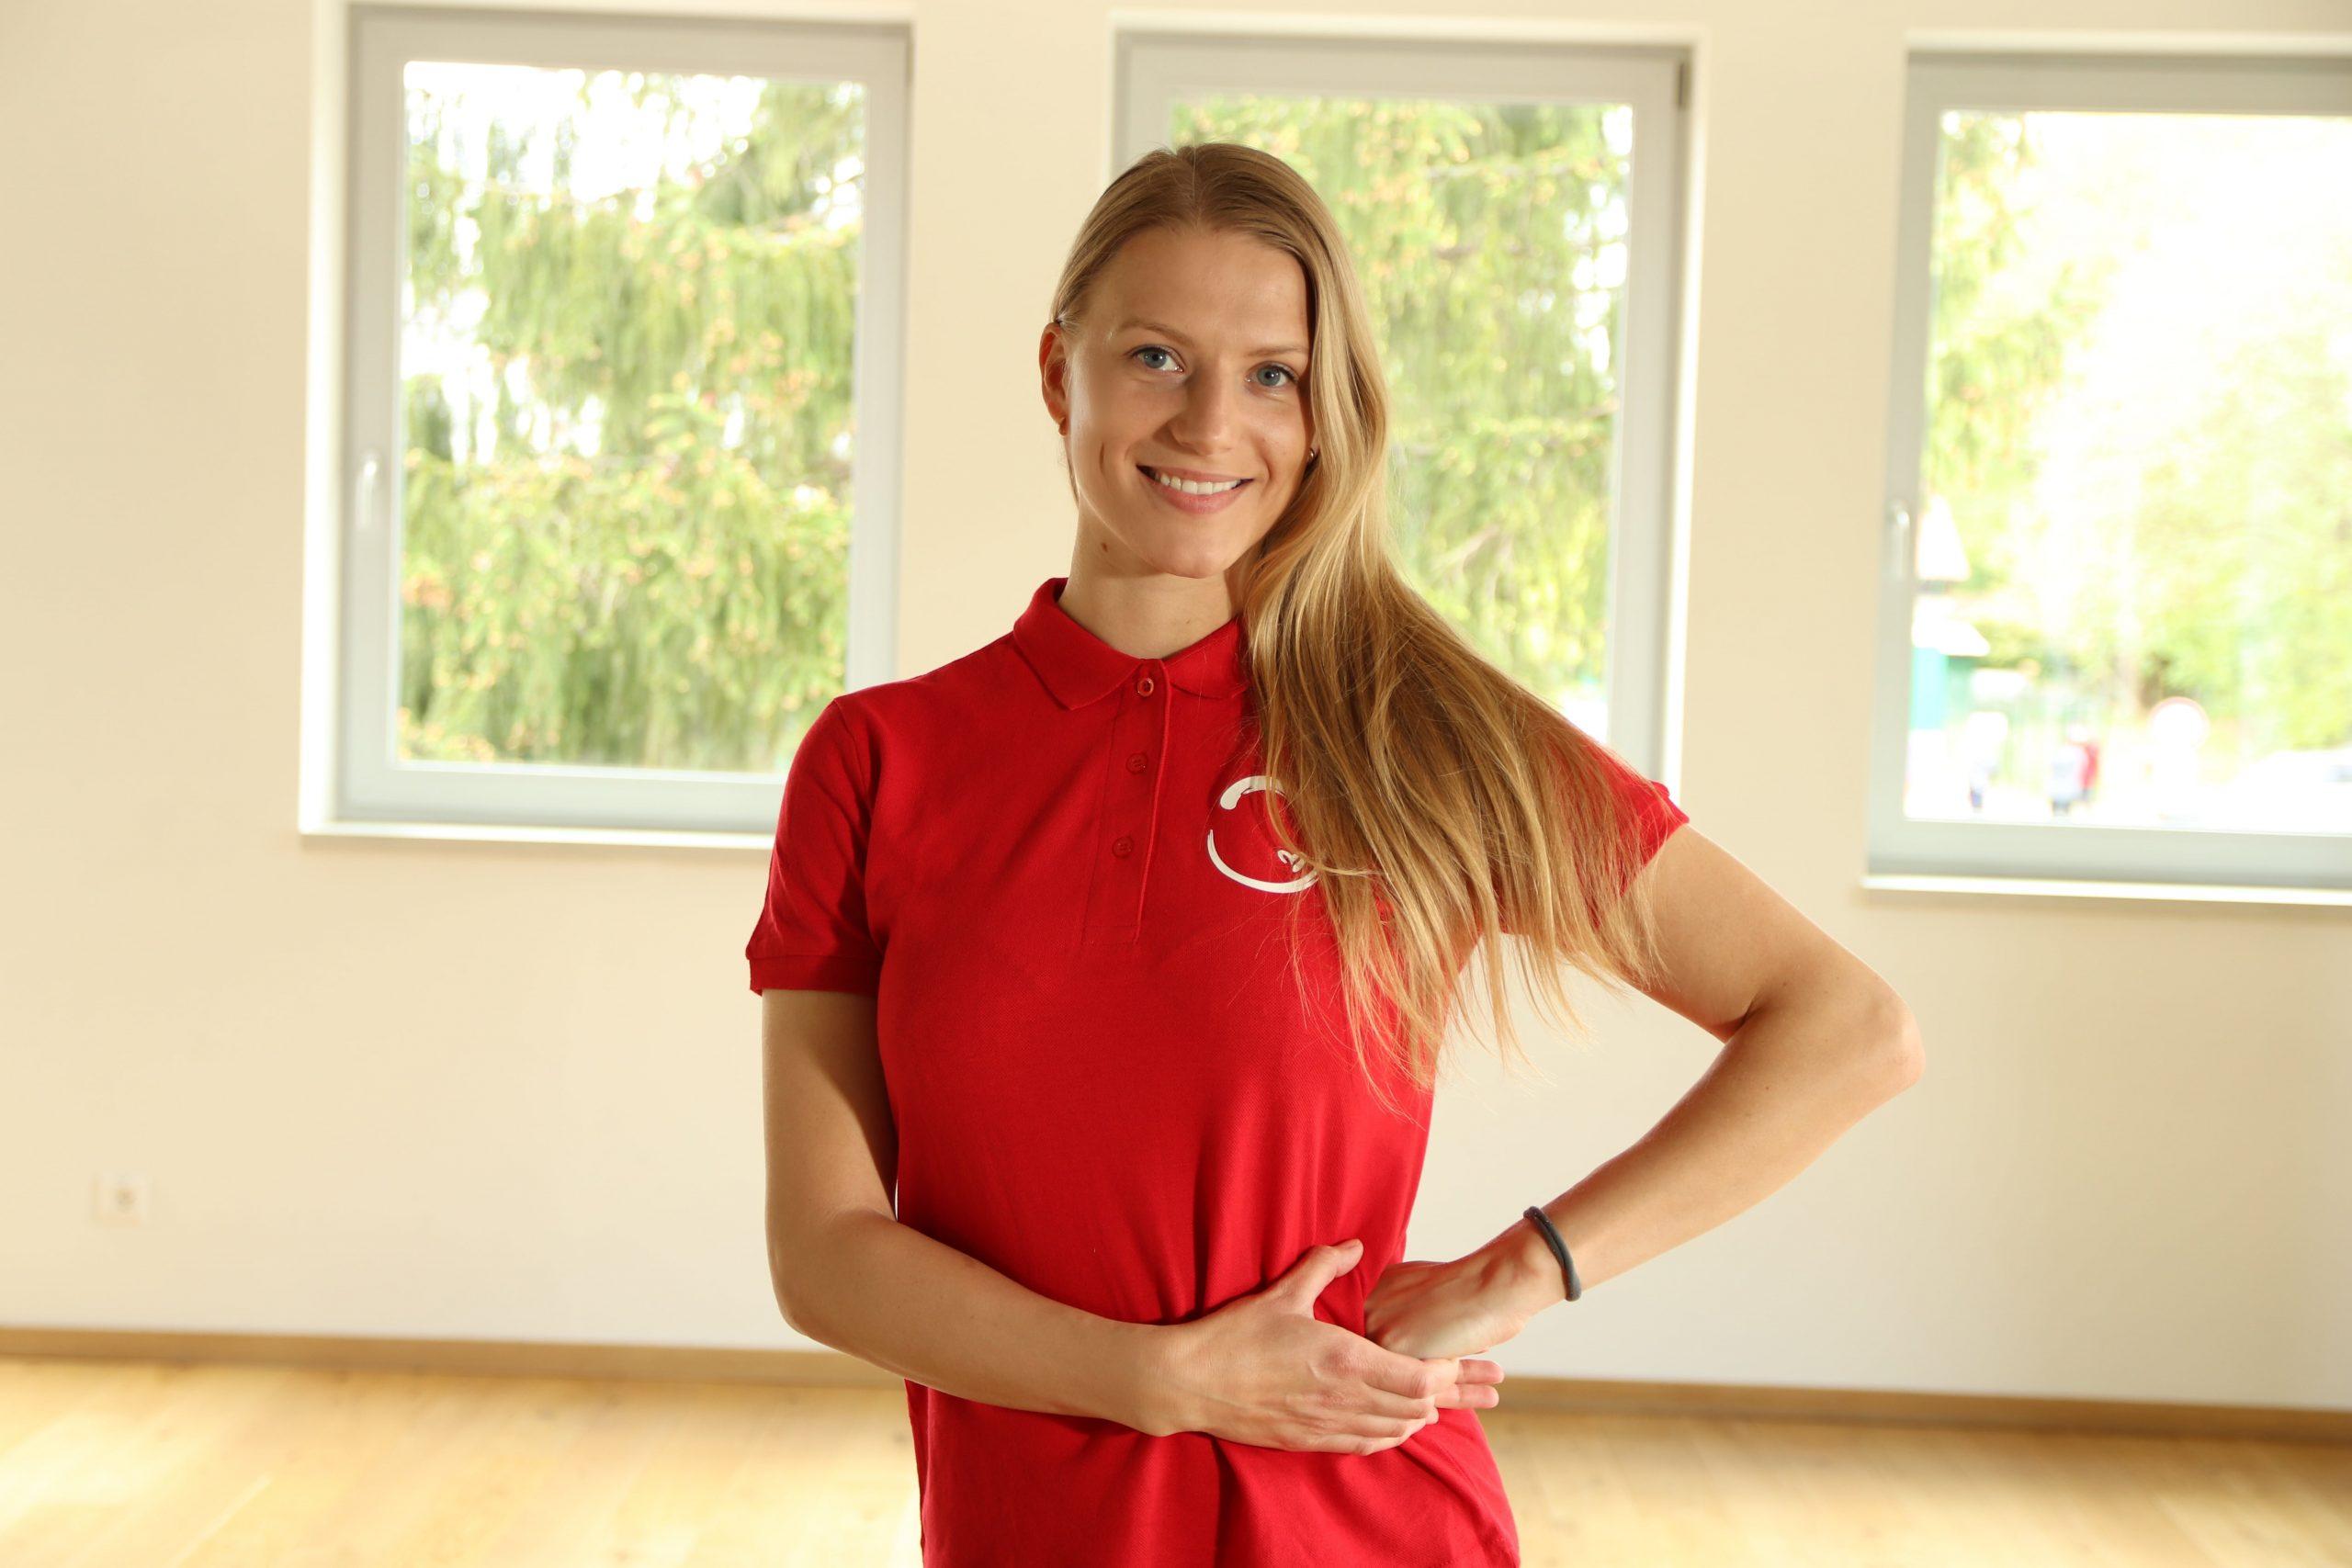 Klaudia Michaldová